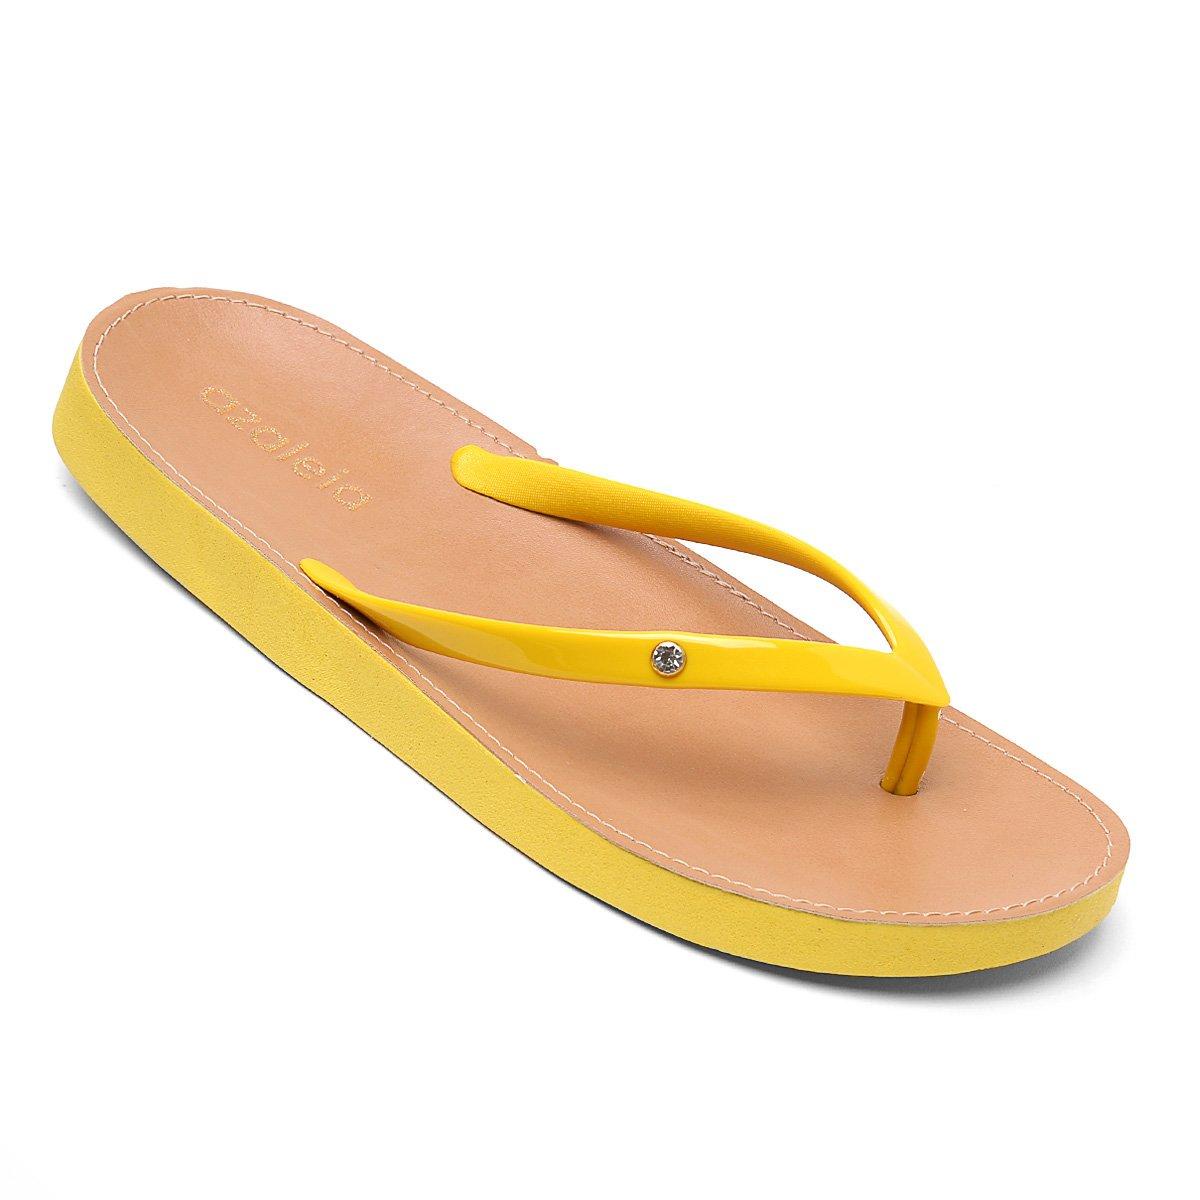 2430d5c36 Chinelo Azaleia Palmilha Natural Feminino - Amarelo